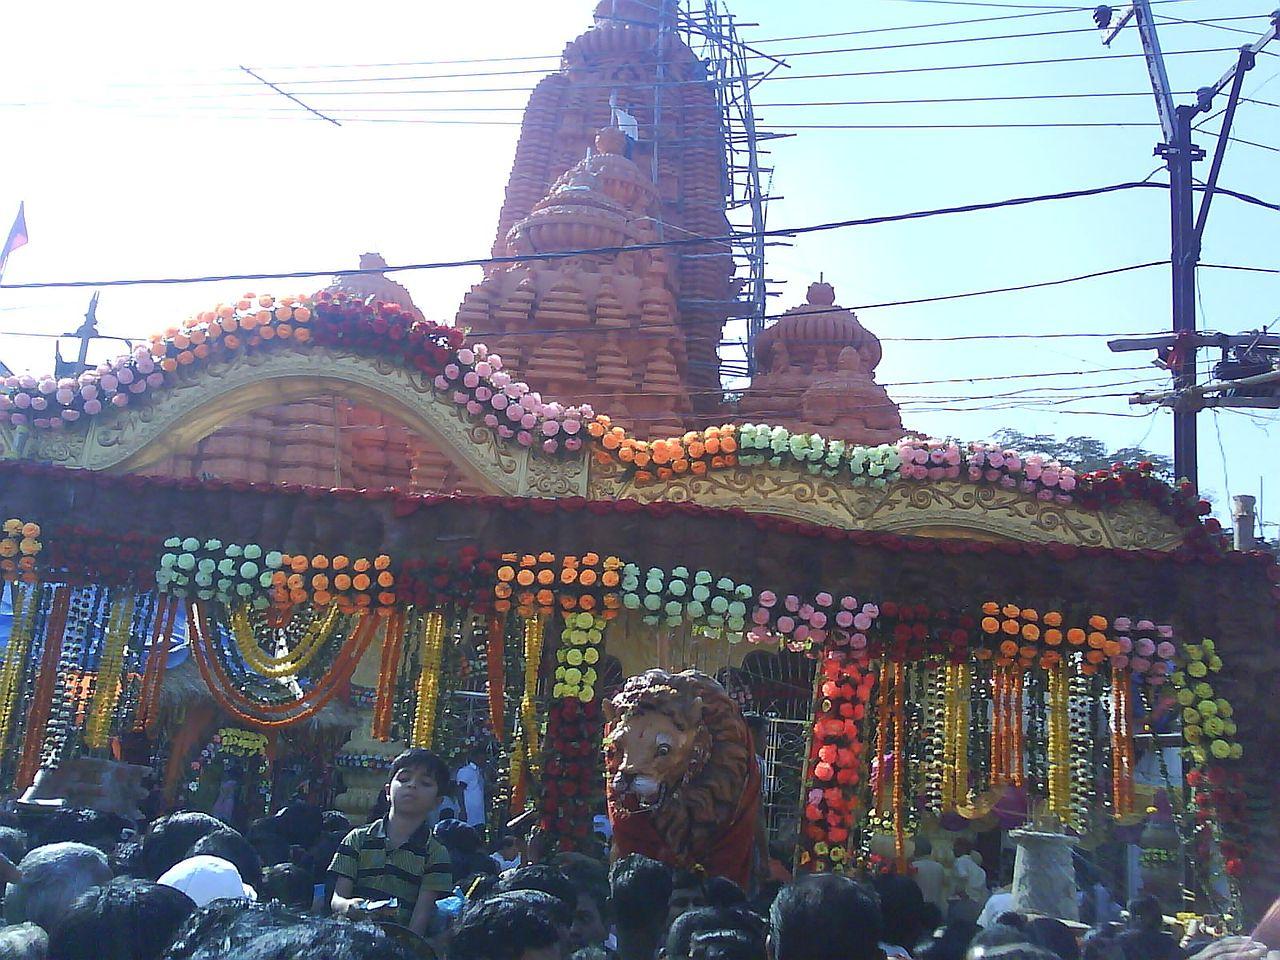 Ahilya Sthan - Amazing Darbhanga Tourist Spot for a great trip Bihar-Tourism